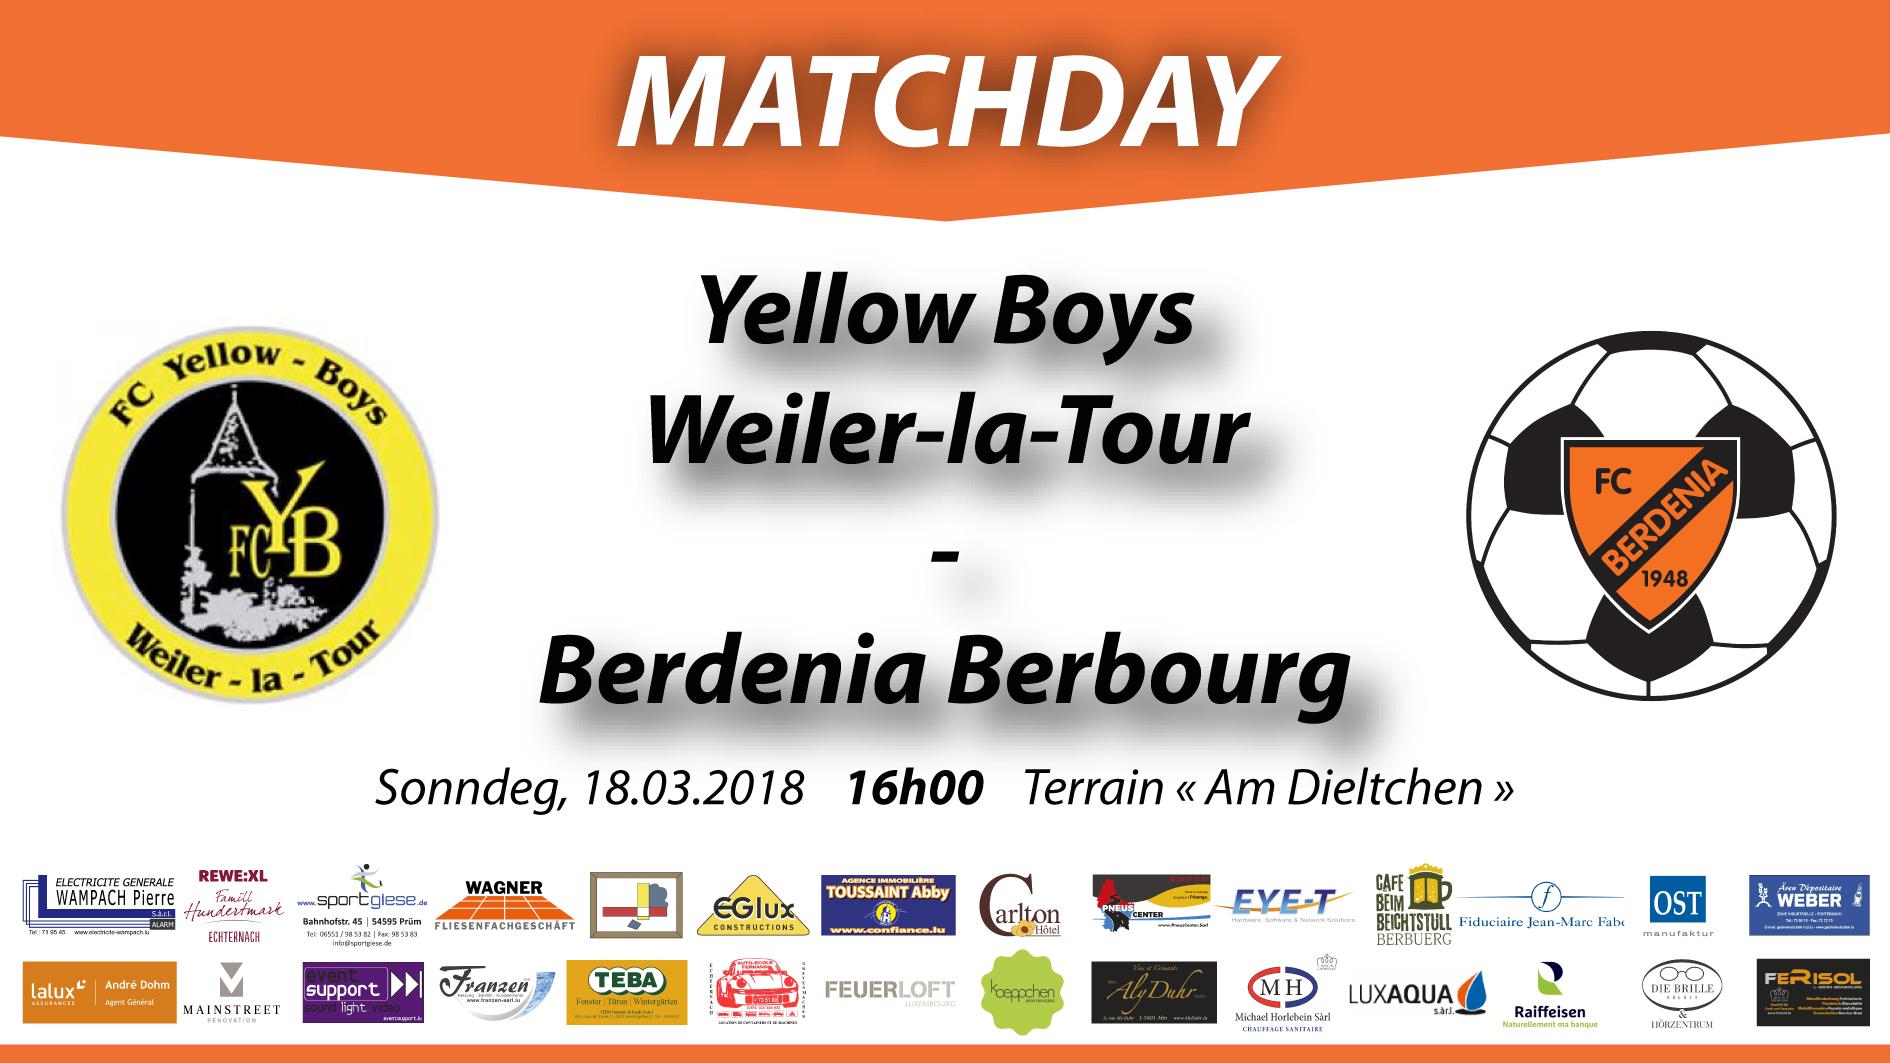 MATCHDAY: FC Yellow Boy Weiler-la-tour - FC Berdenia Berbourg